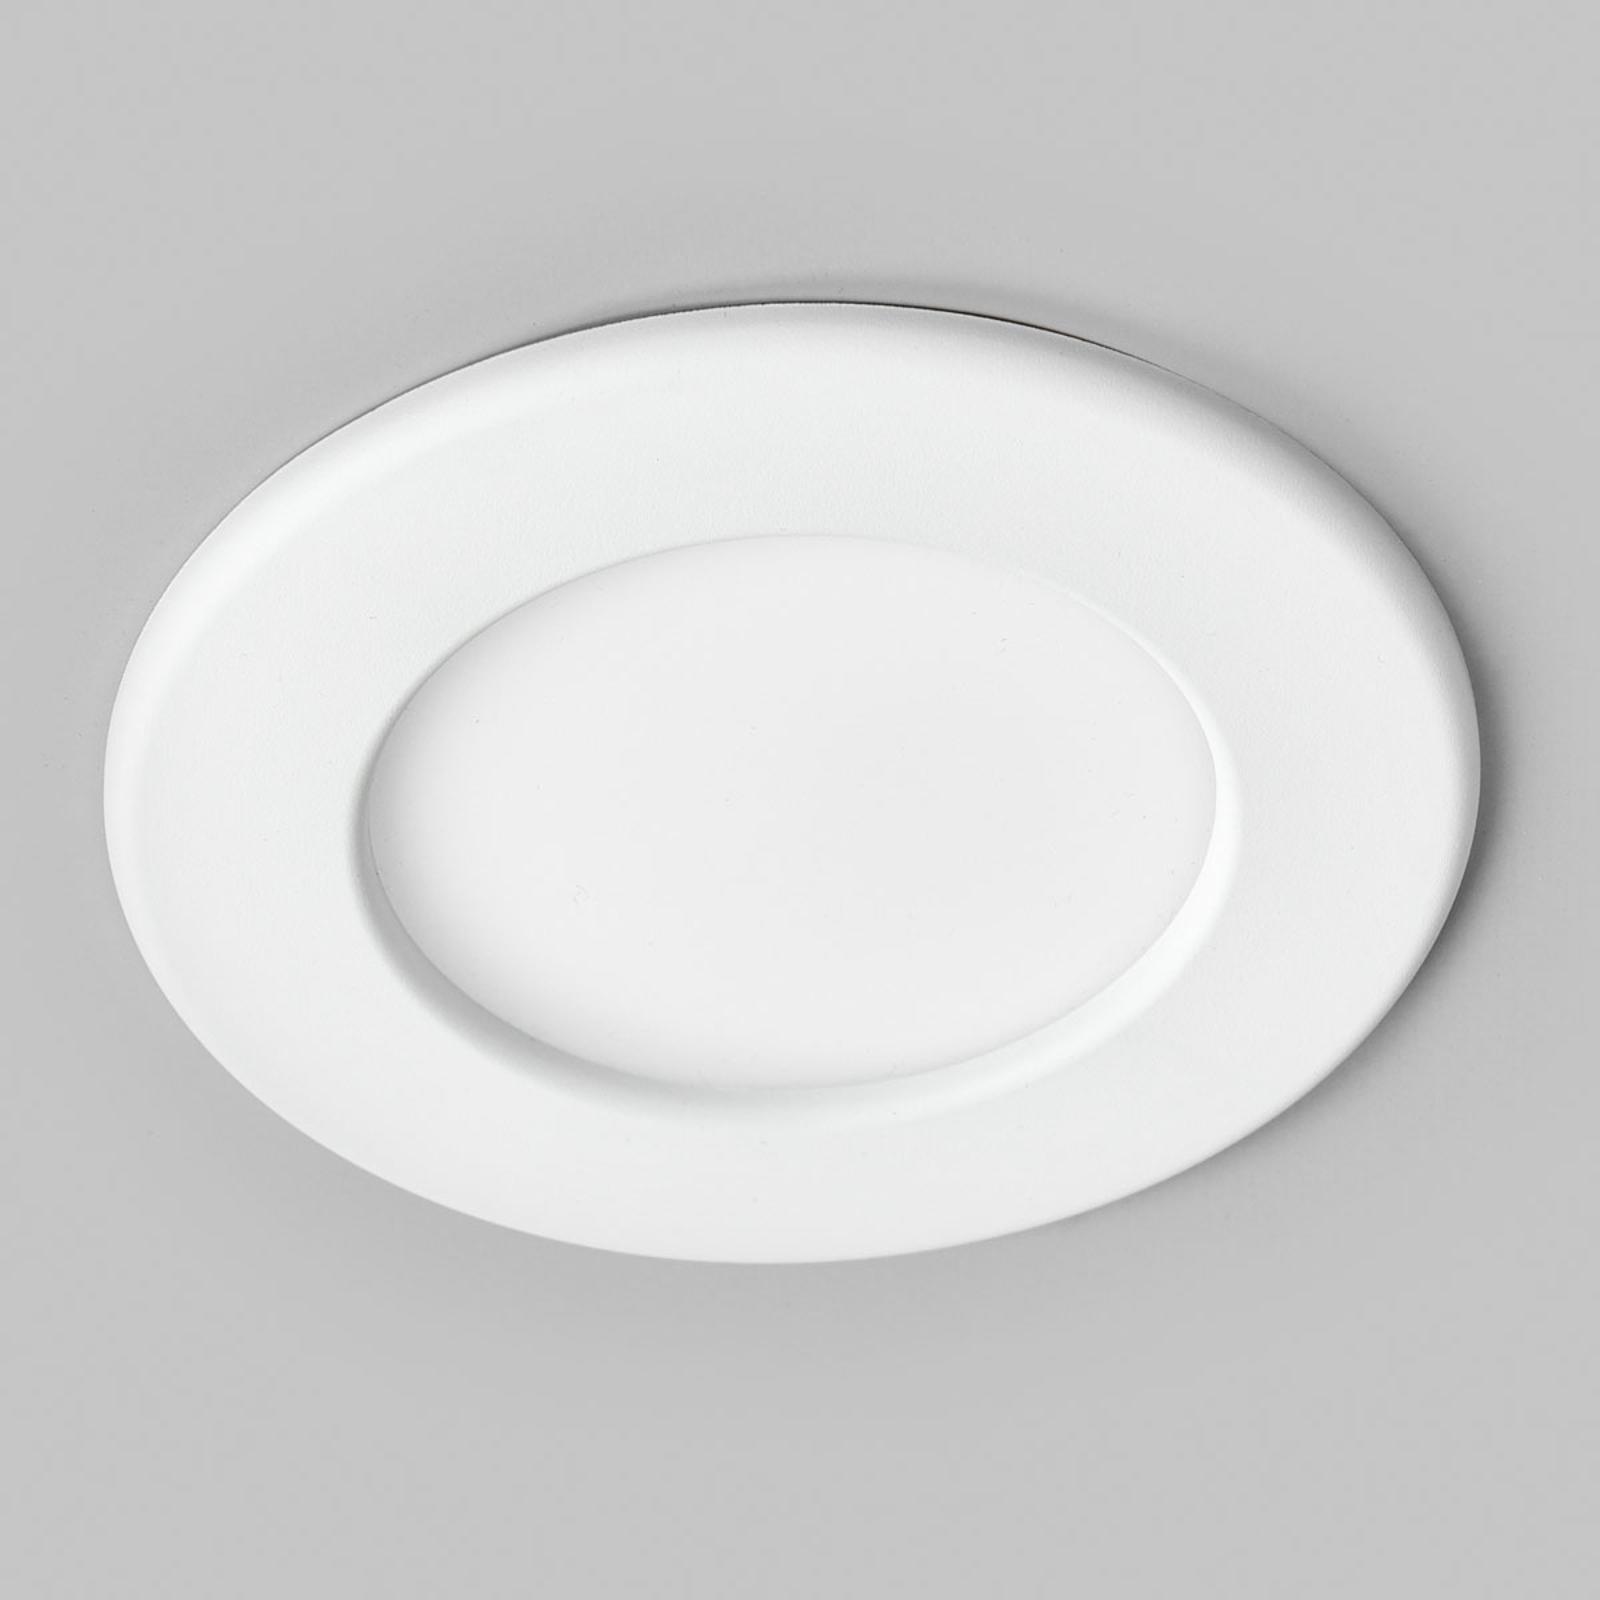 Spot encastré LED Joki blanc 4000K rond 11,5cm